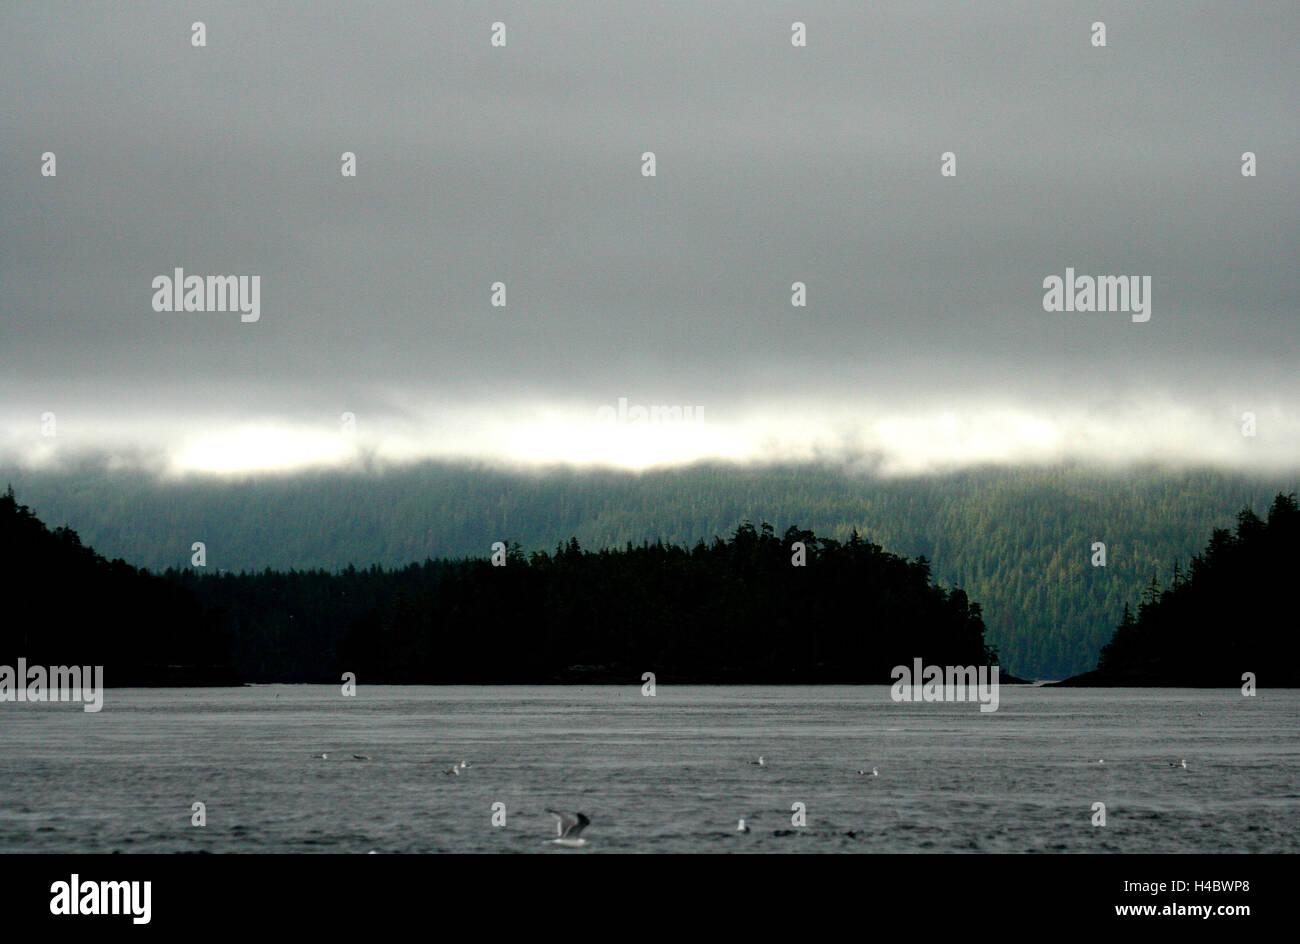 Johnstone strait. Vancouver island. British Columbia. Canada - Stock Image